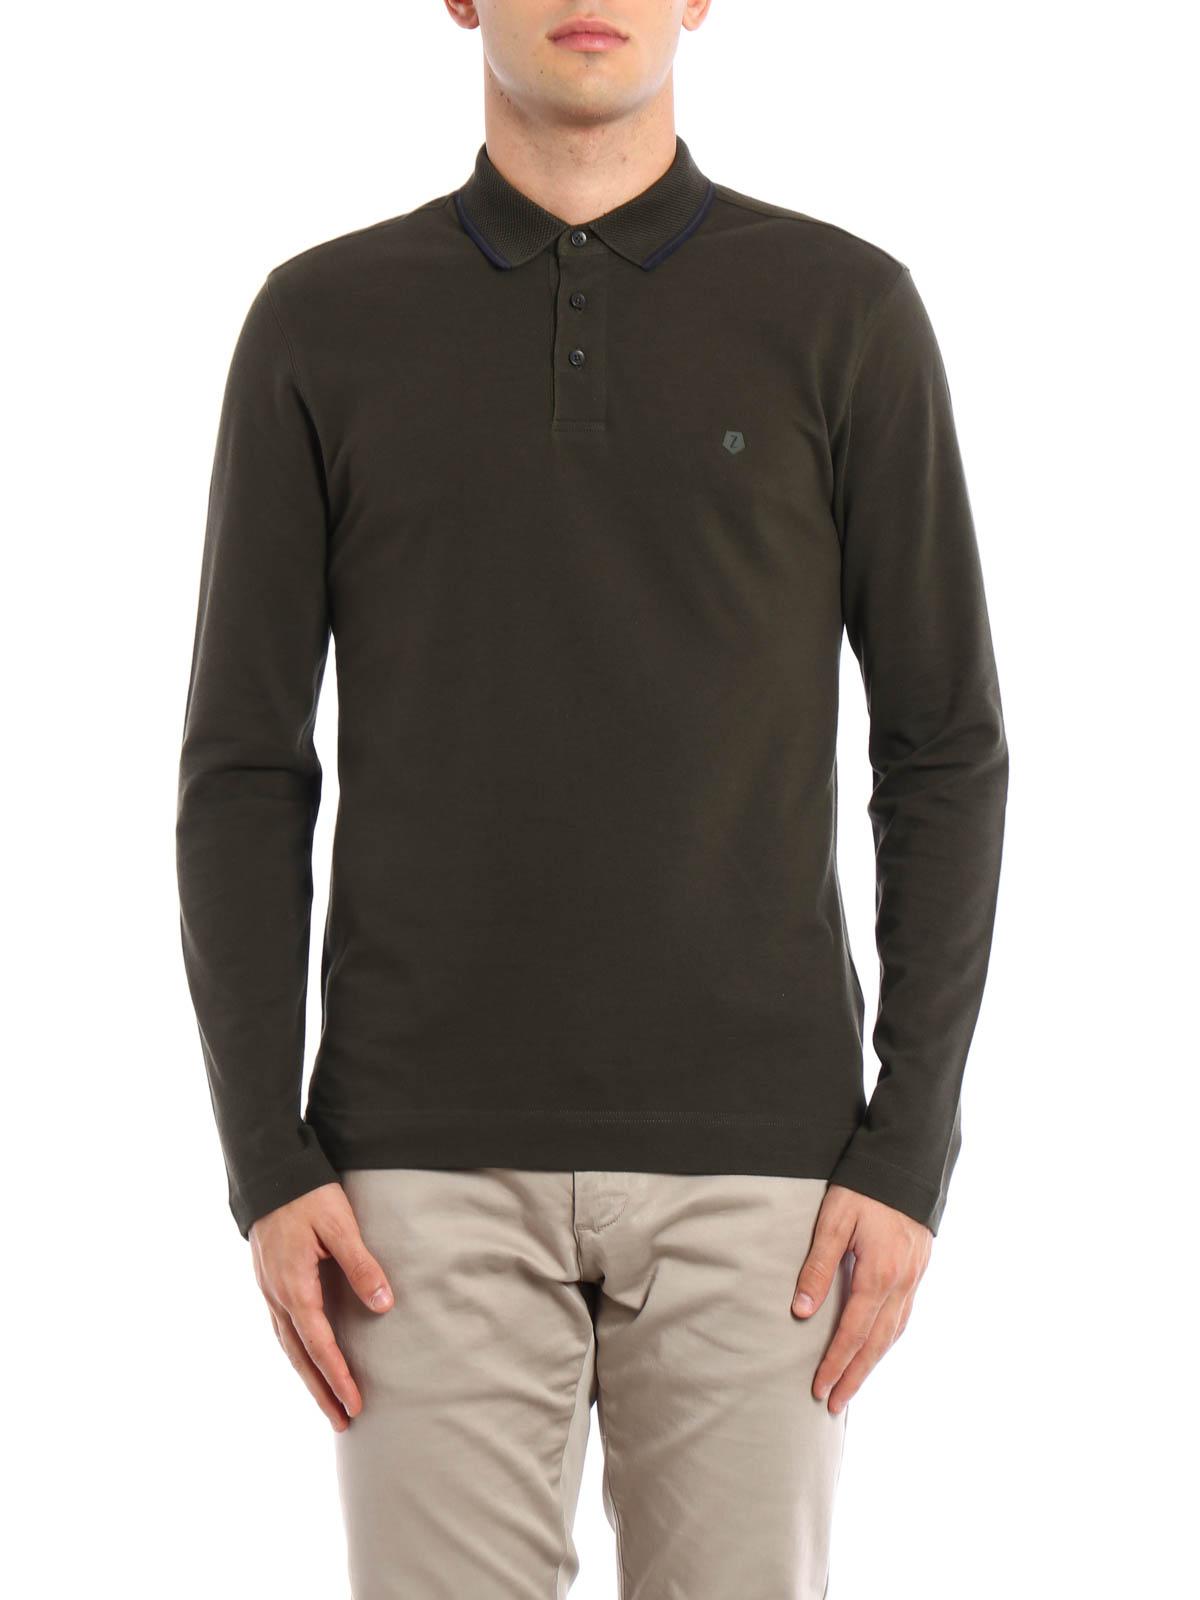 Long sleeves polo shirt by z zegna polo shirts shop for Zegna polo shirts sale